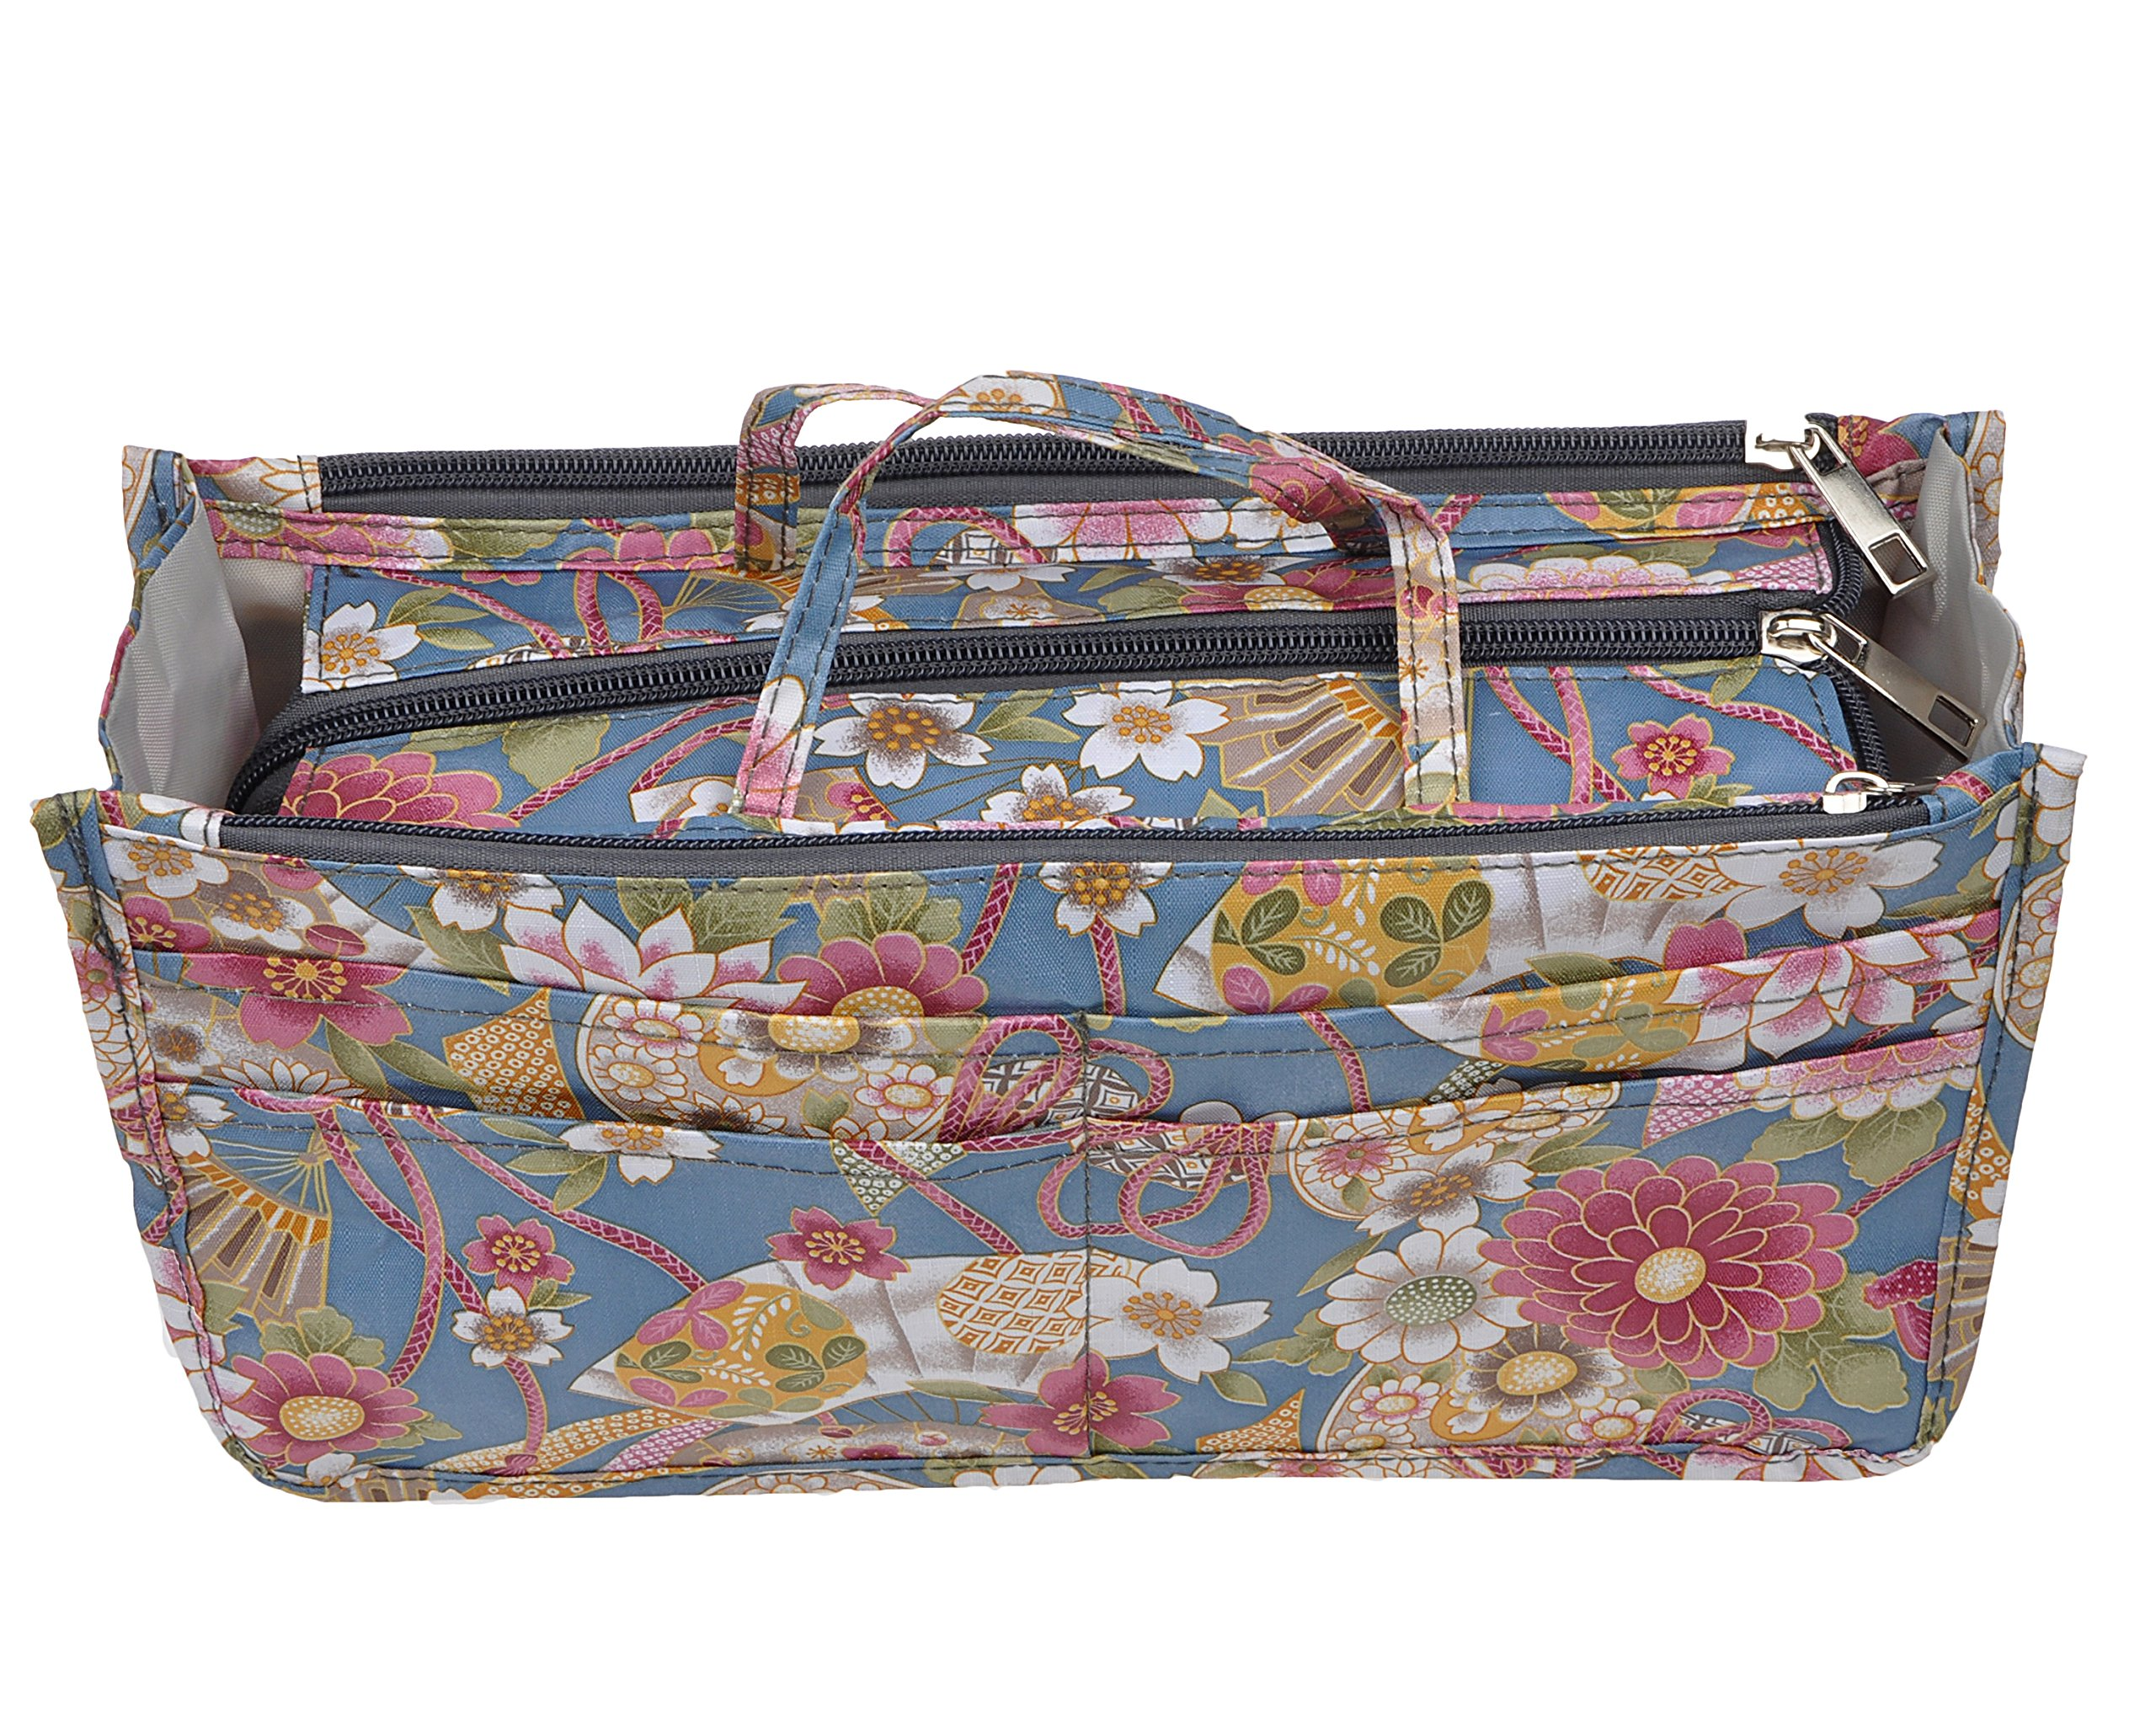 Vercord Printed Purse Handbag Tote Insert Organizer 13 Pockets With Zipper Handle Happy Flowers Medium